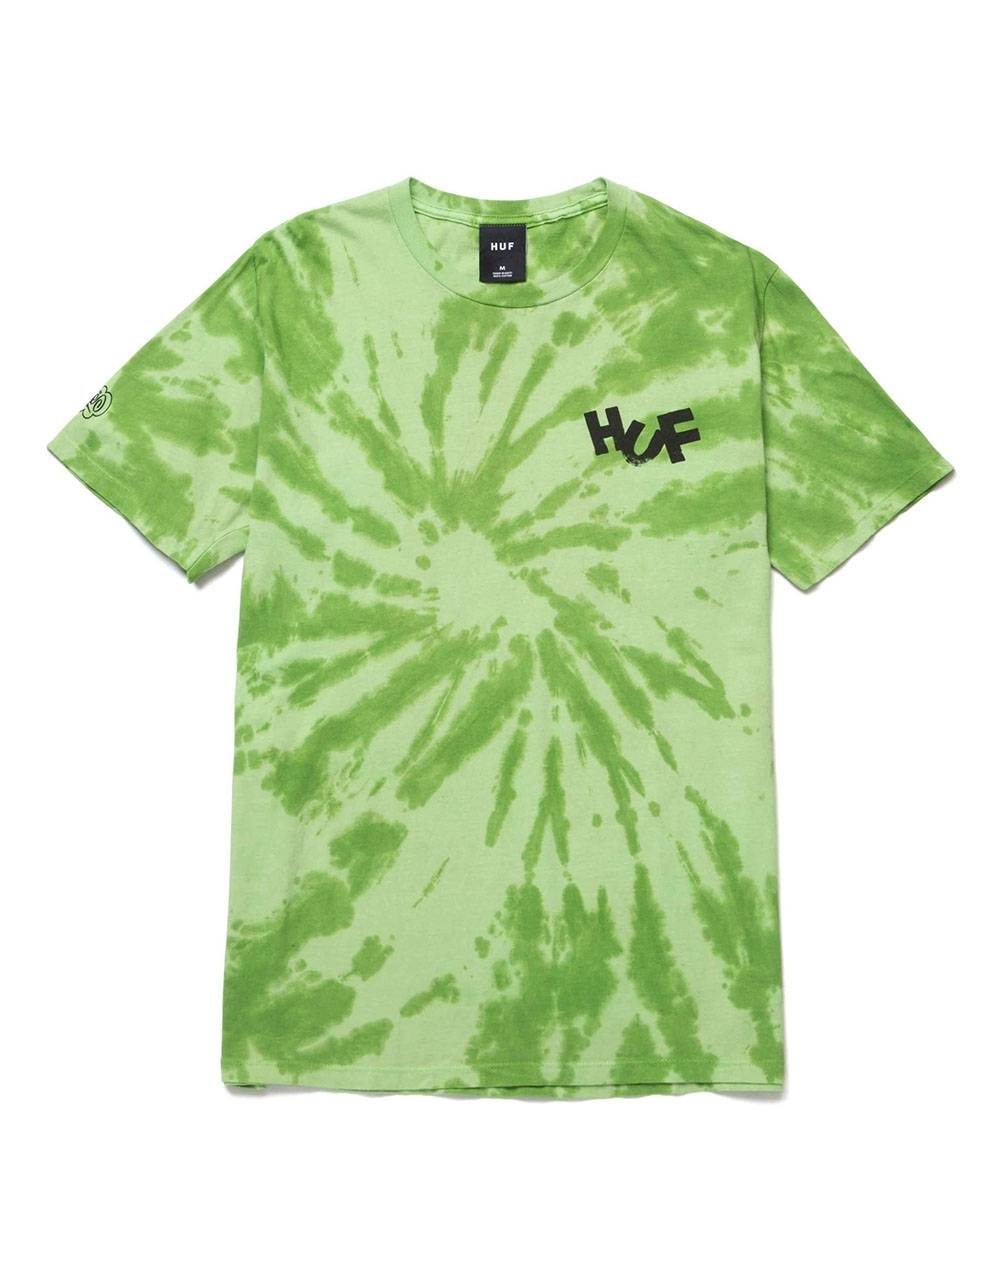 Huf Haze brush tie dye t-shirt - lime Huf T-shirt 45,08€